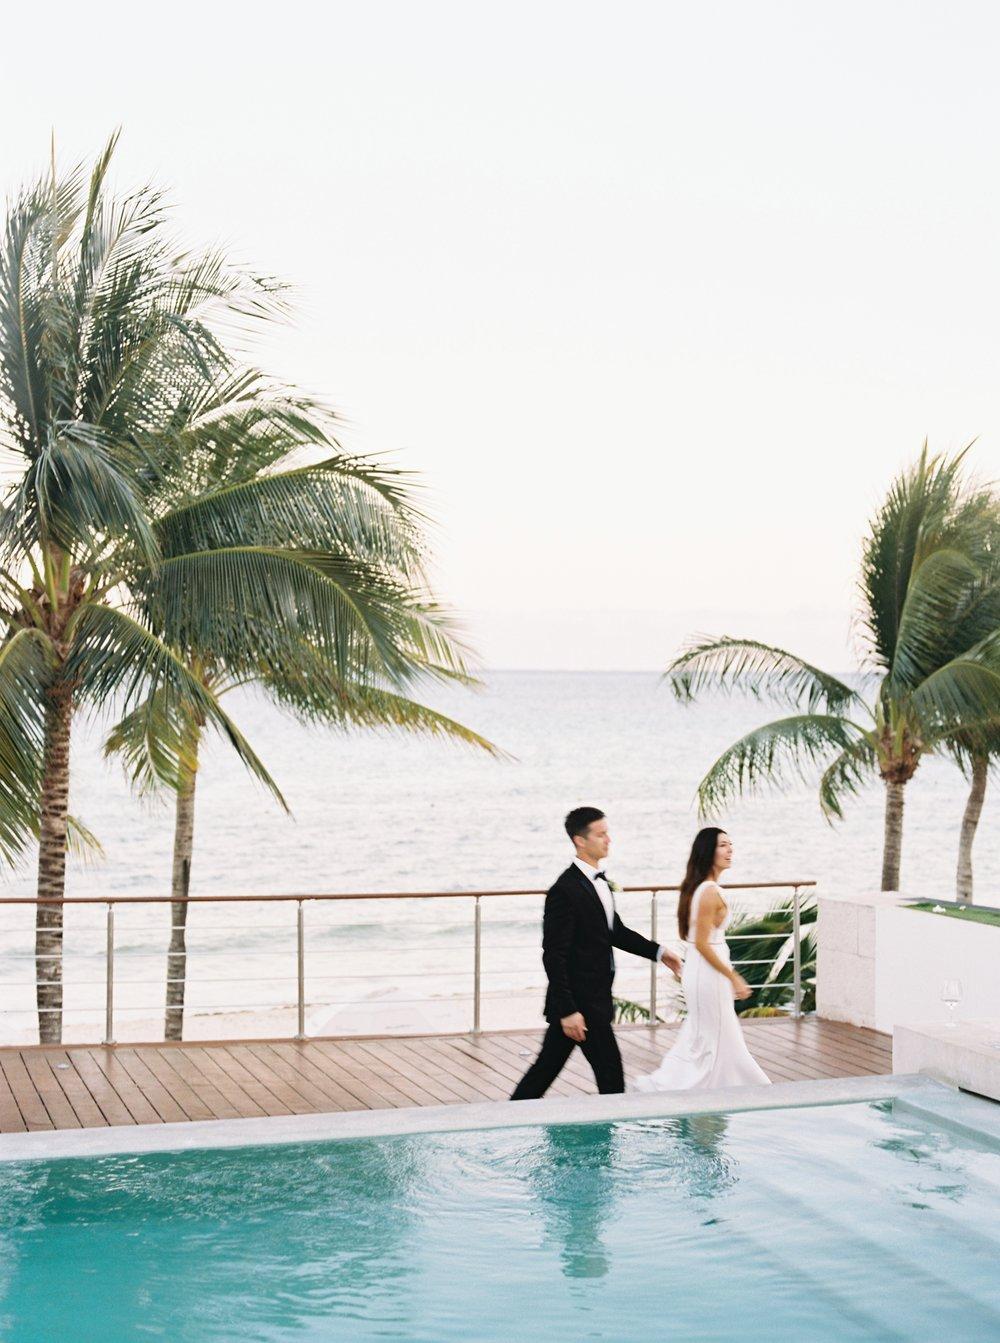 Kyle John l Fine Art Wedding Photography l Chicago, Copenhagen, California, New York, Destination l Blog l Brooke Boyd_The Film Poets_Tulum Wedding_38